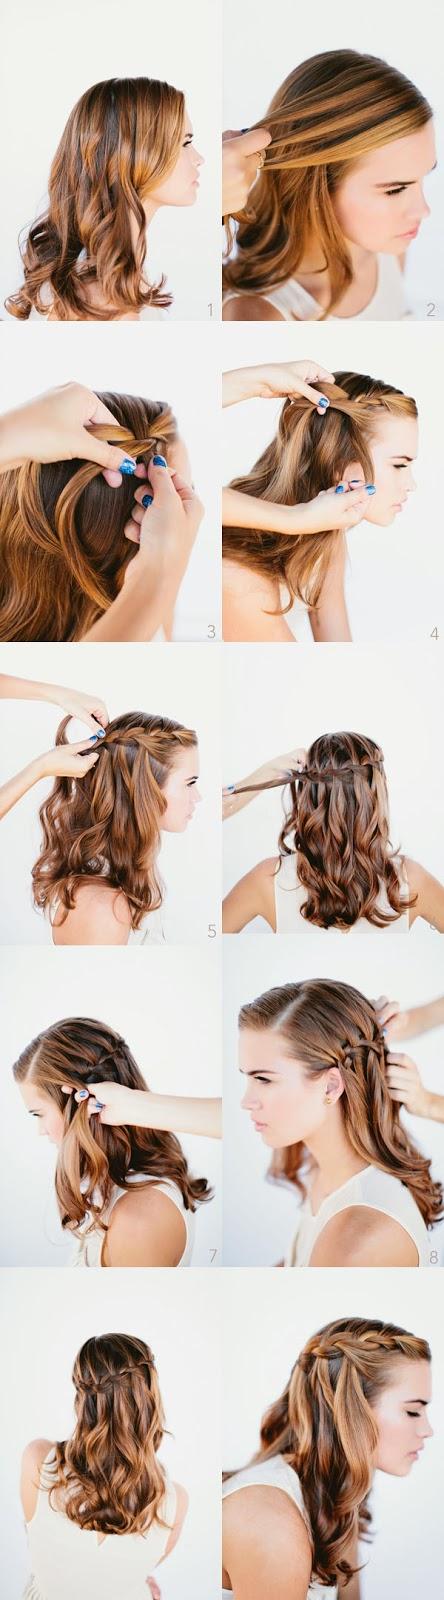 penteados bonitos para cabelos ondulados